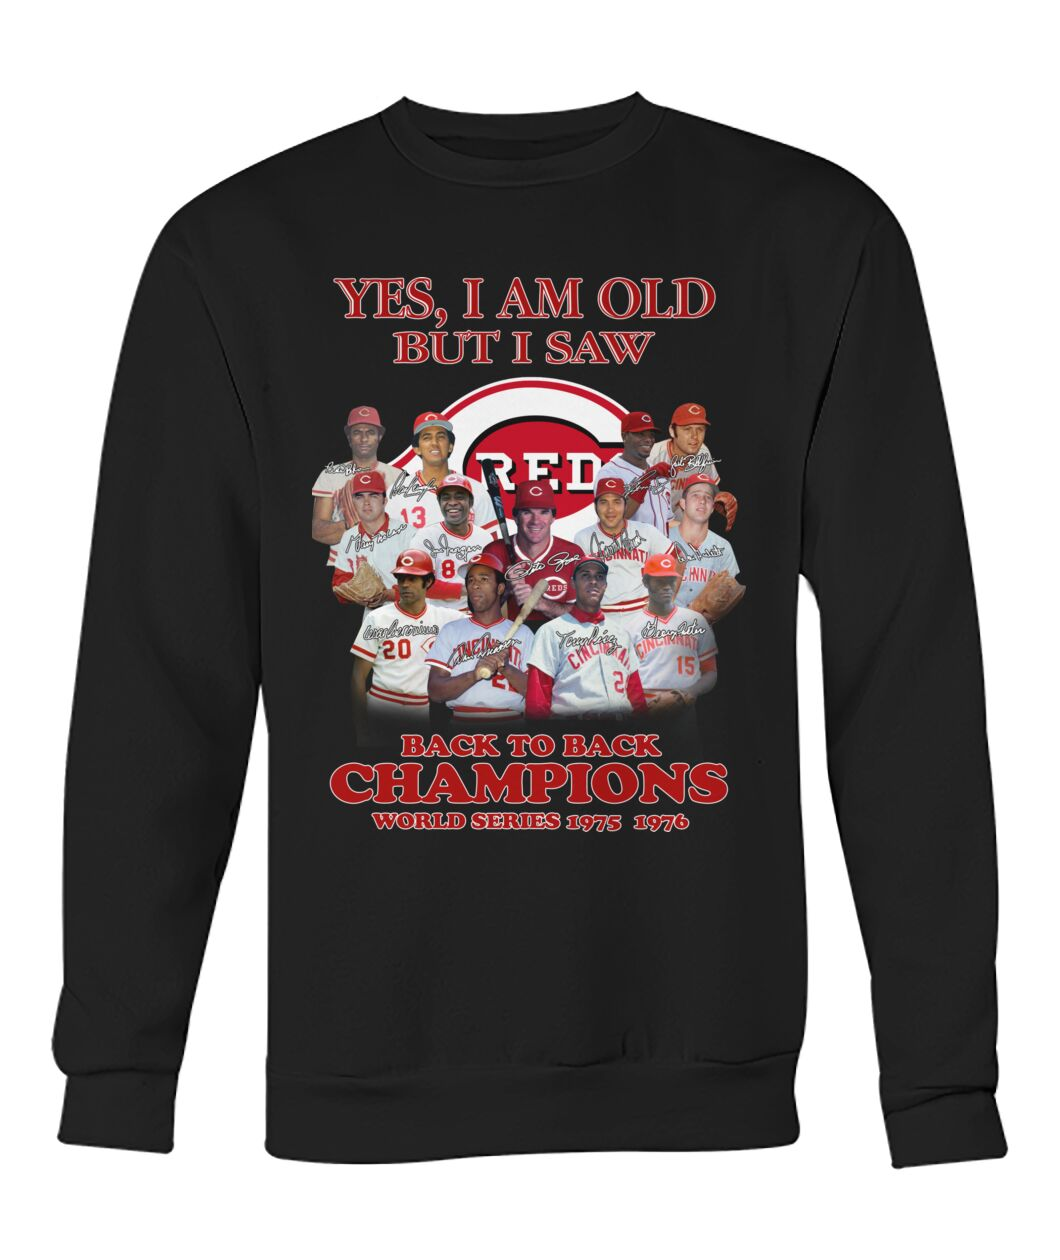 Yes I am old but I saw Cincinnati Reds MLB back to back world champions world series 1975 1976 sweatshirt